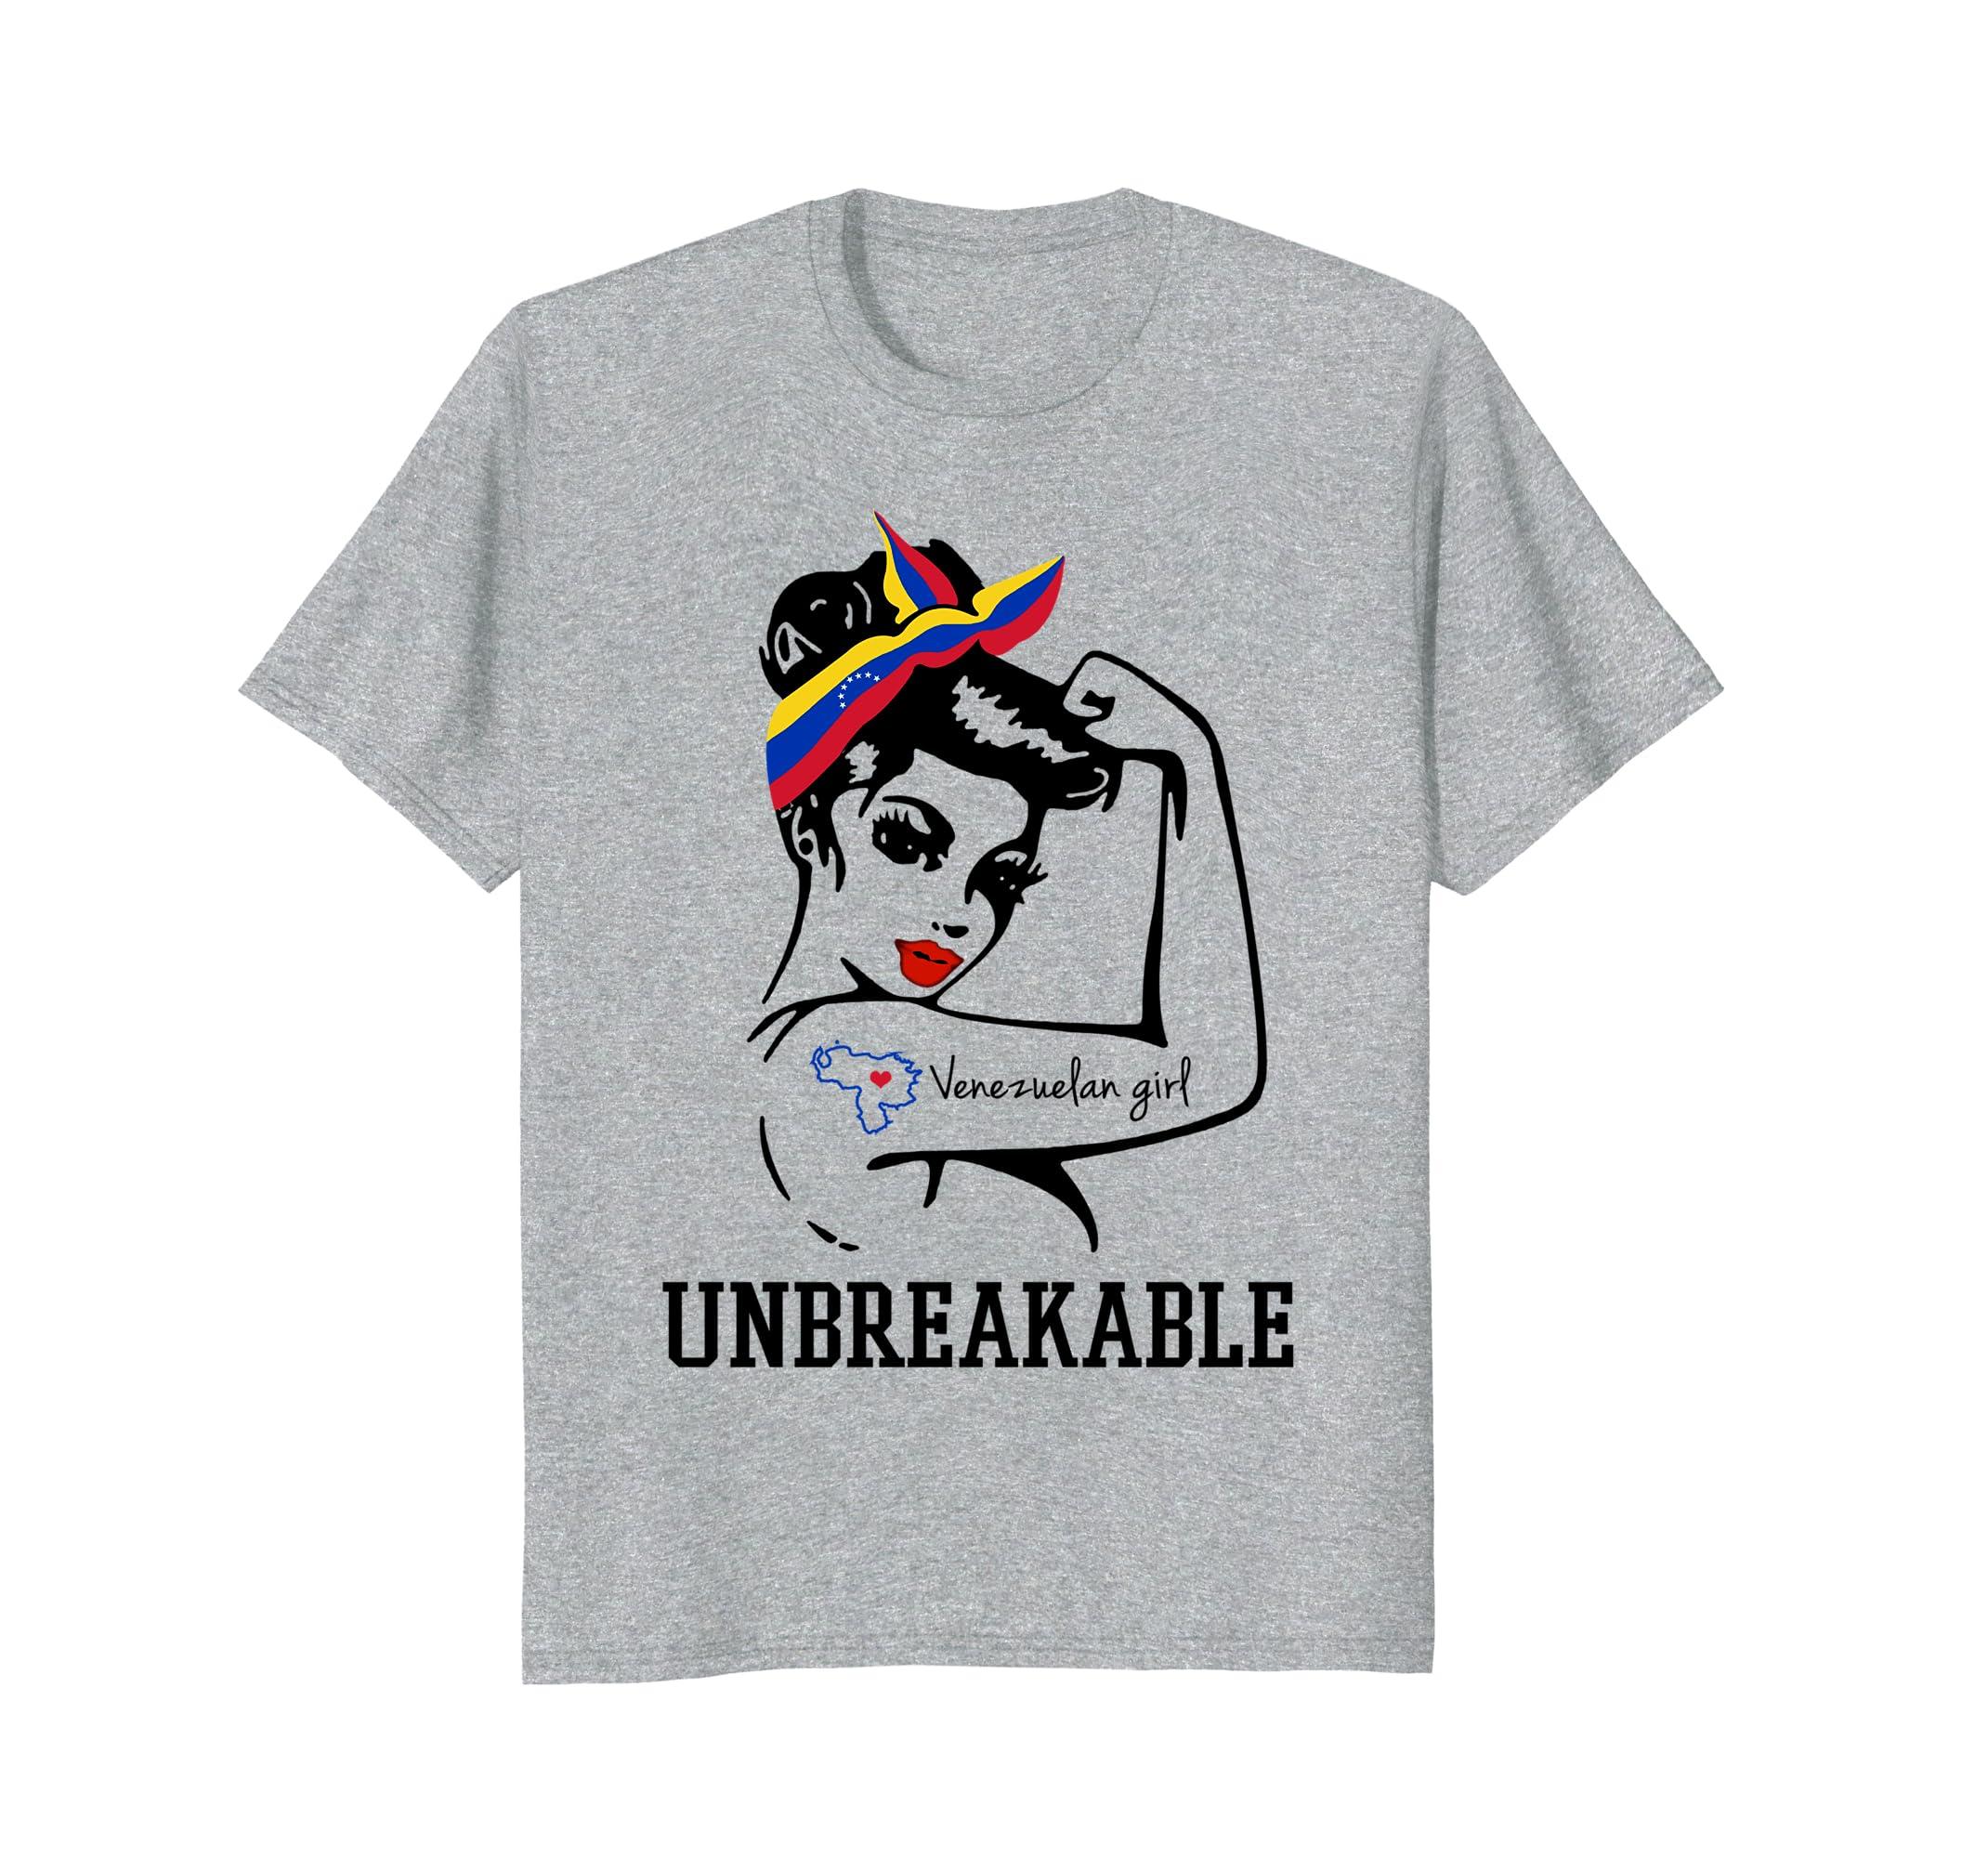 Venezuelan Girl Unbreakable   Great t shirt-Teesml